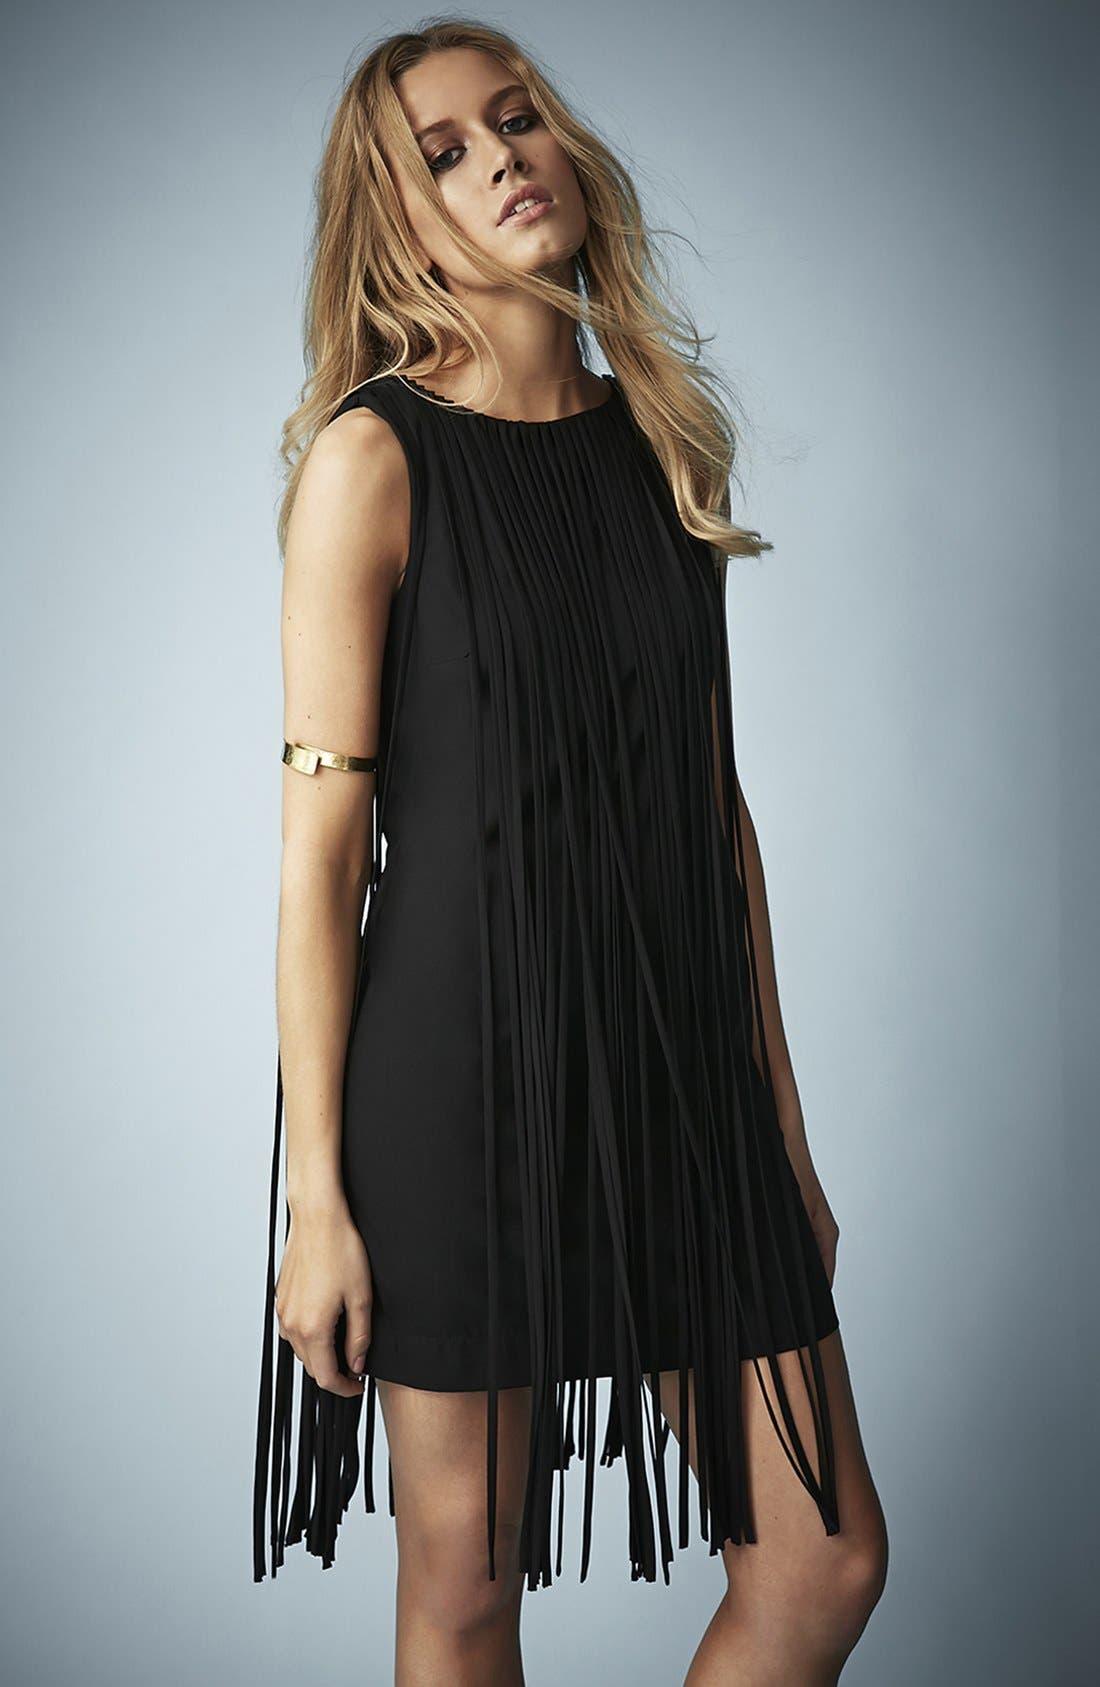 Main Image - Kate Moss for Topshop Long Fringed Tassel Dress